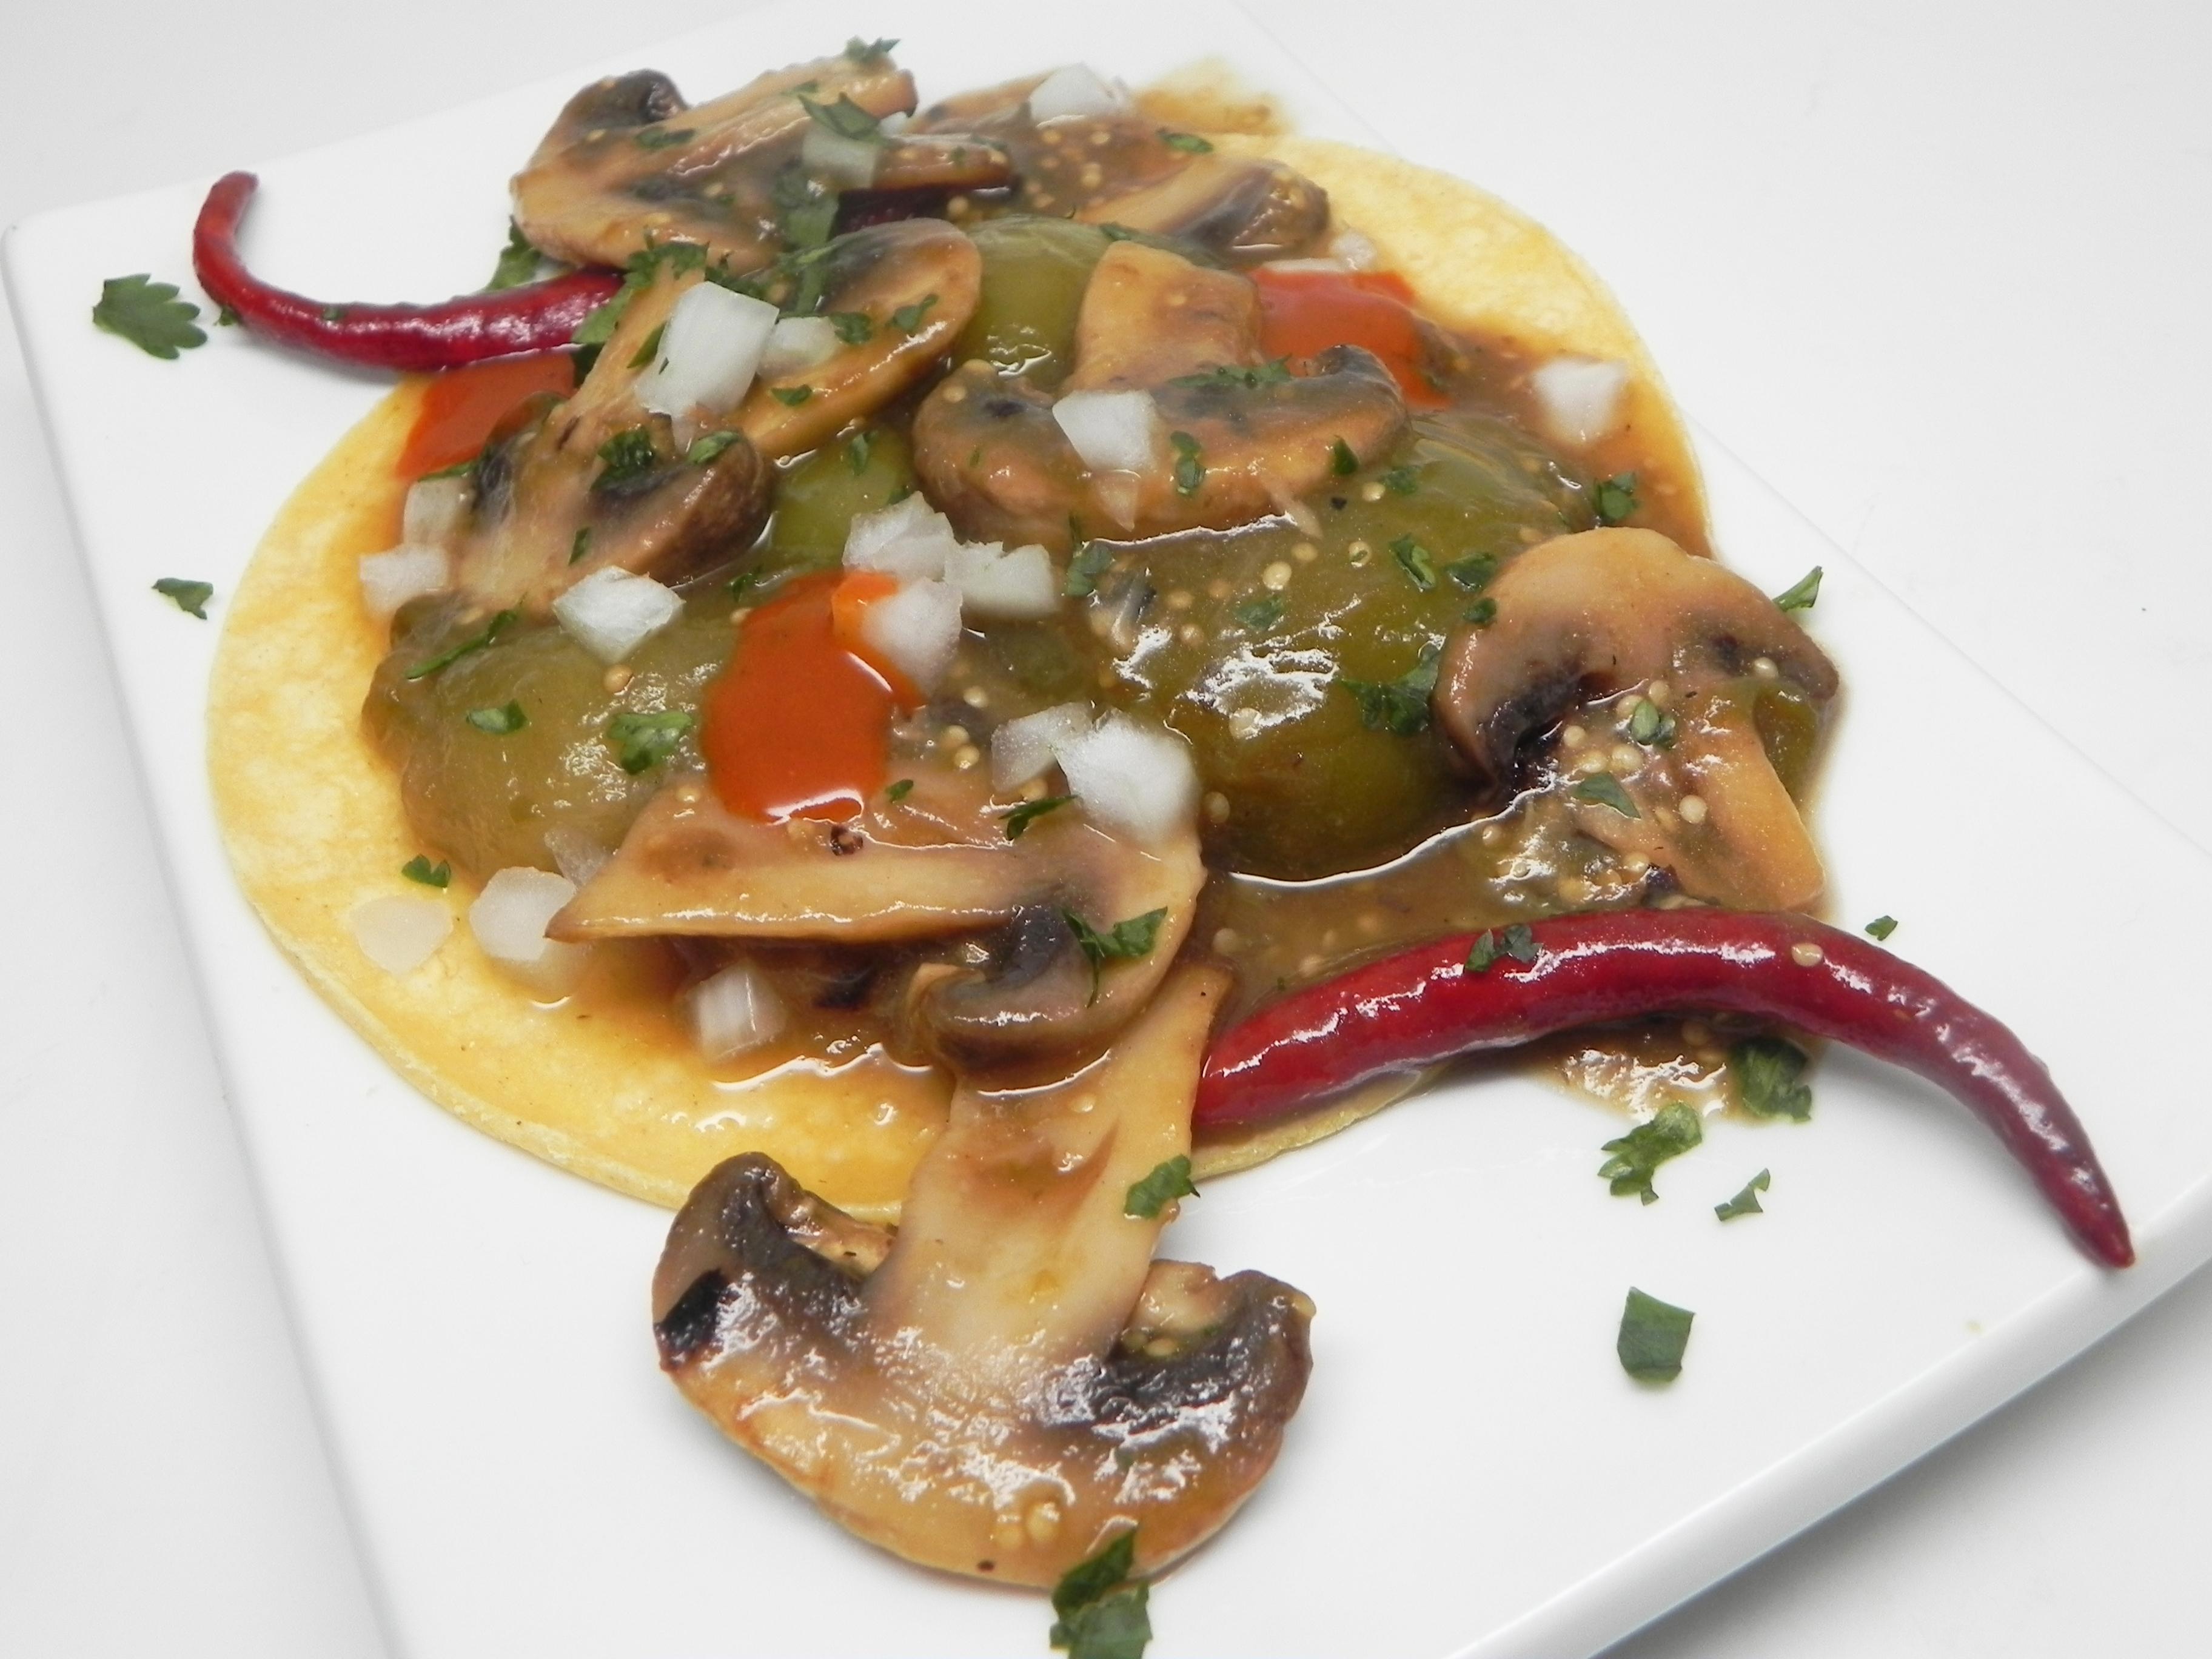 Vegan Tacos with Mushrooms and Tomatillos